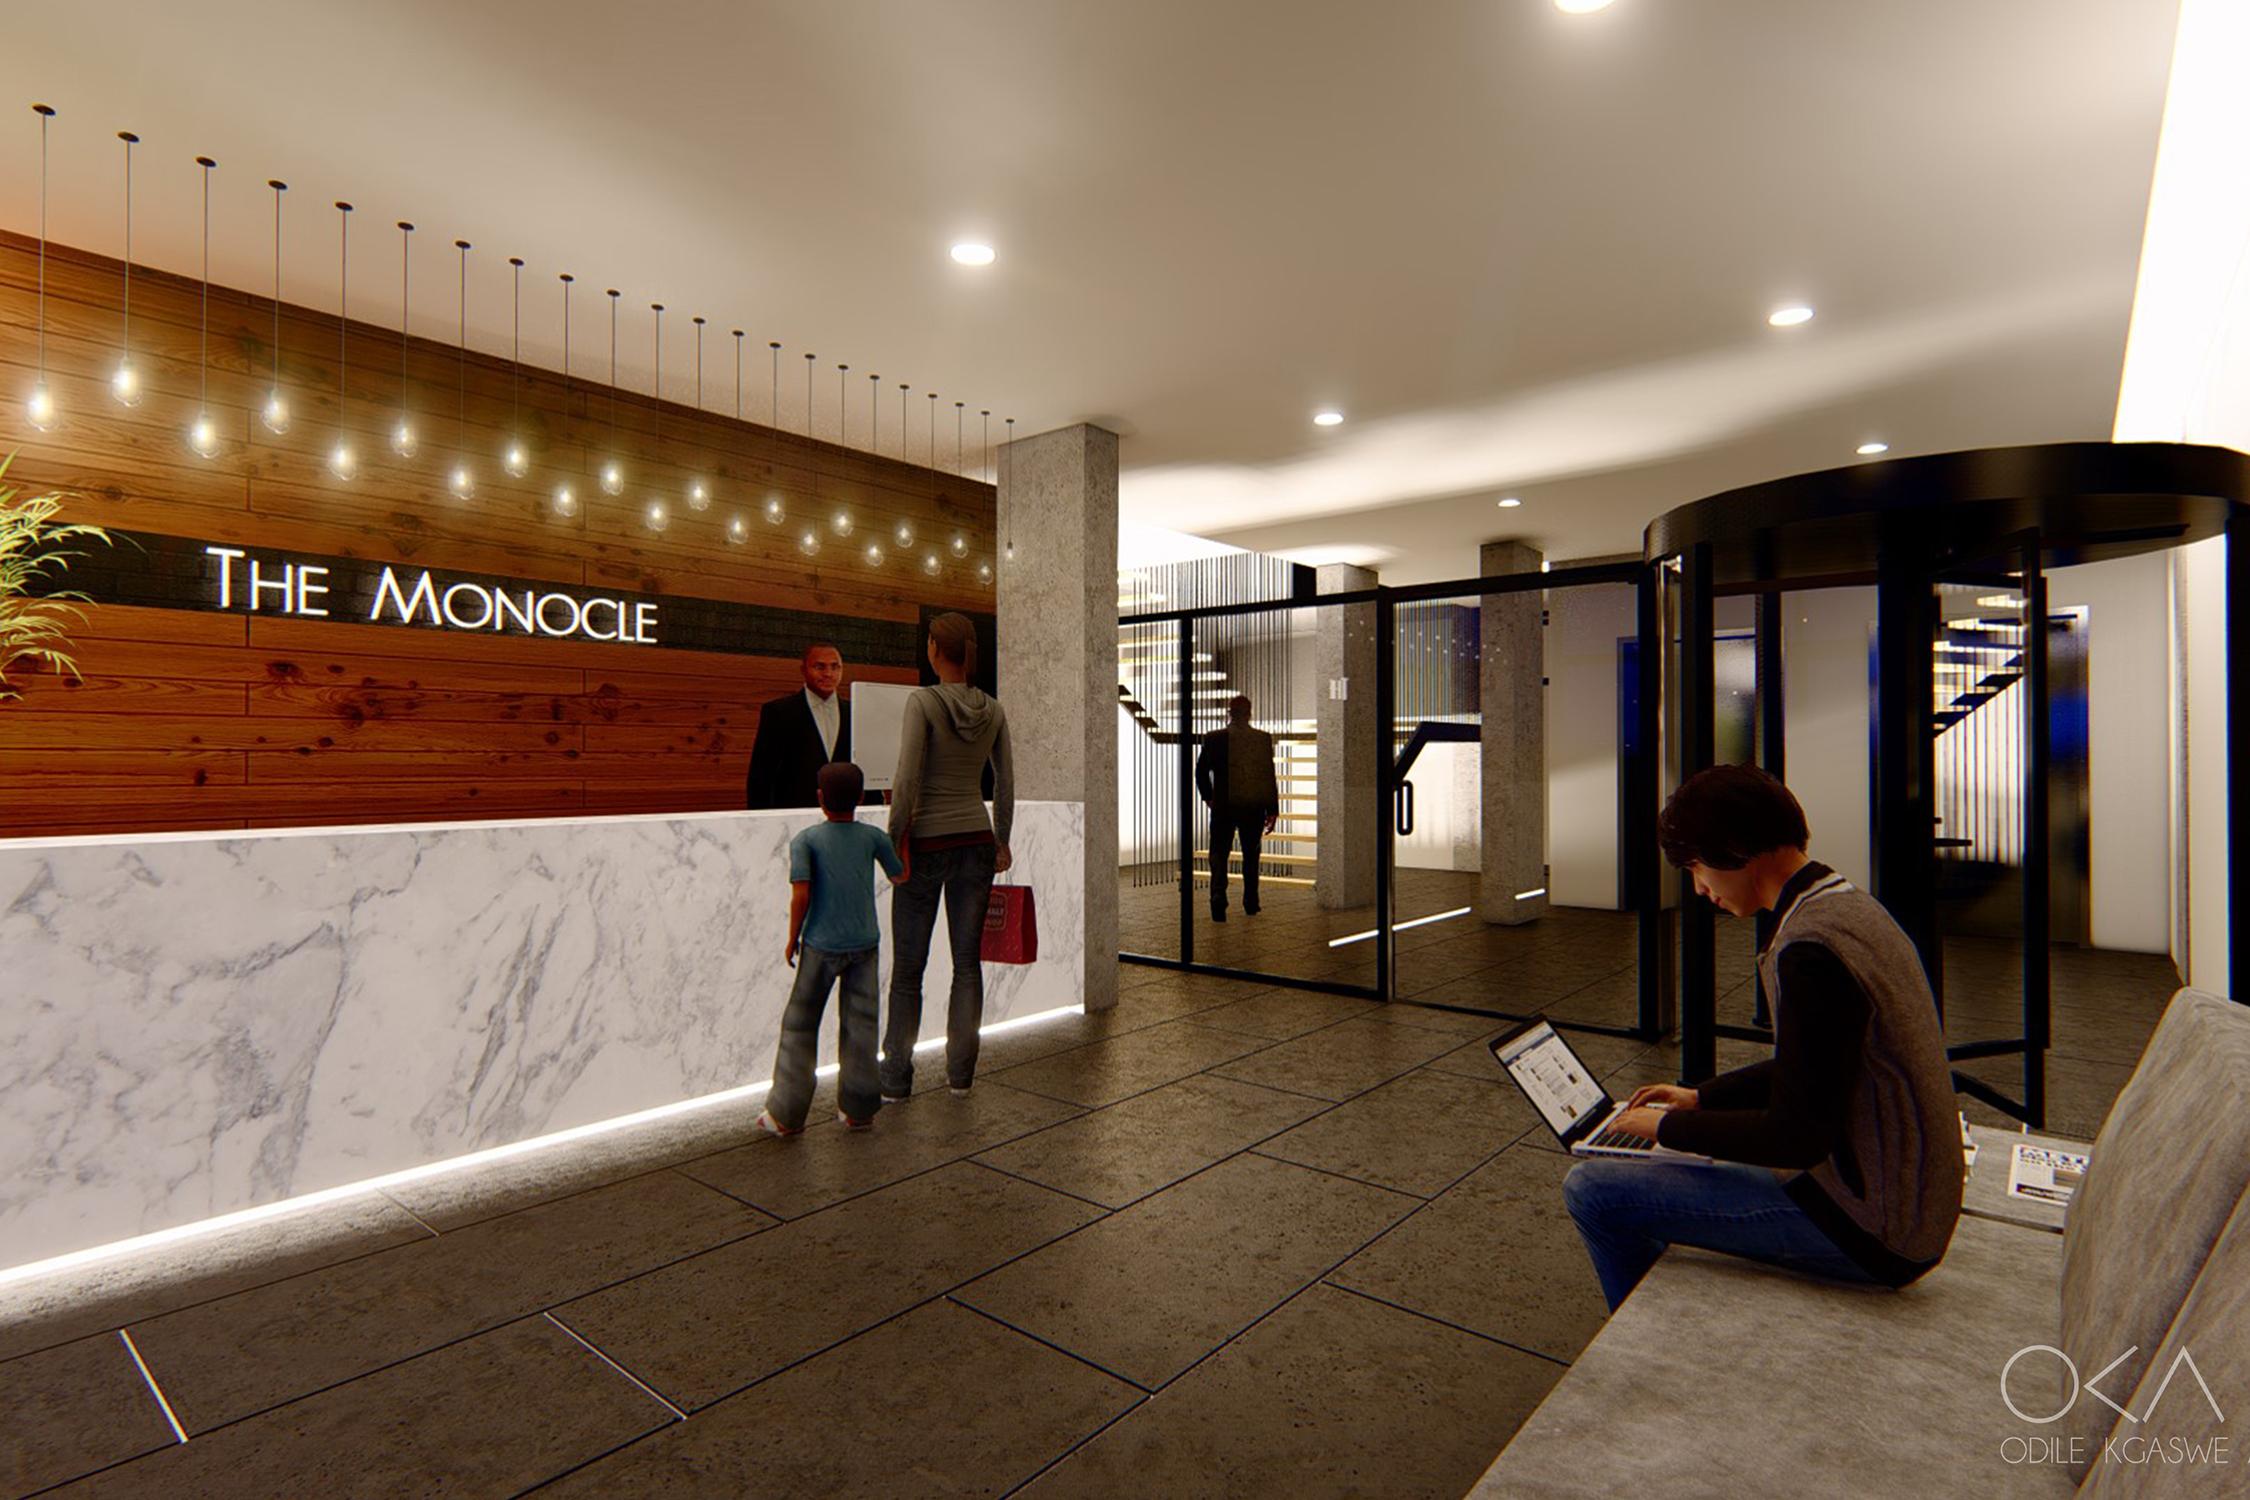 The Monocle, Johannesburg